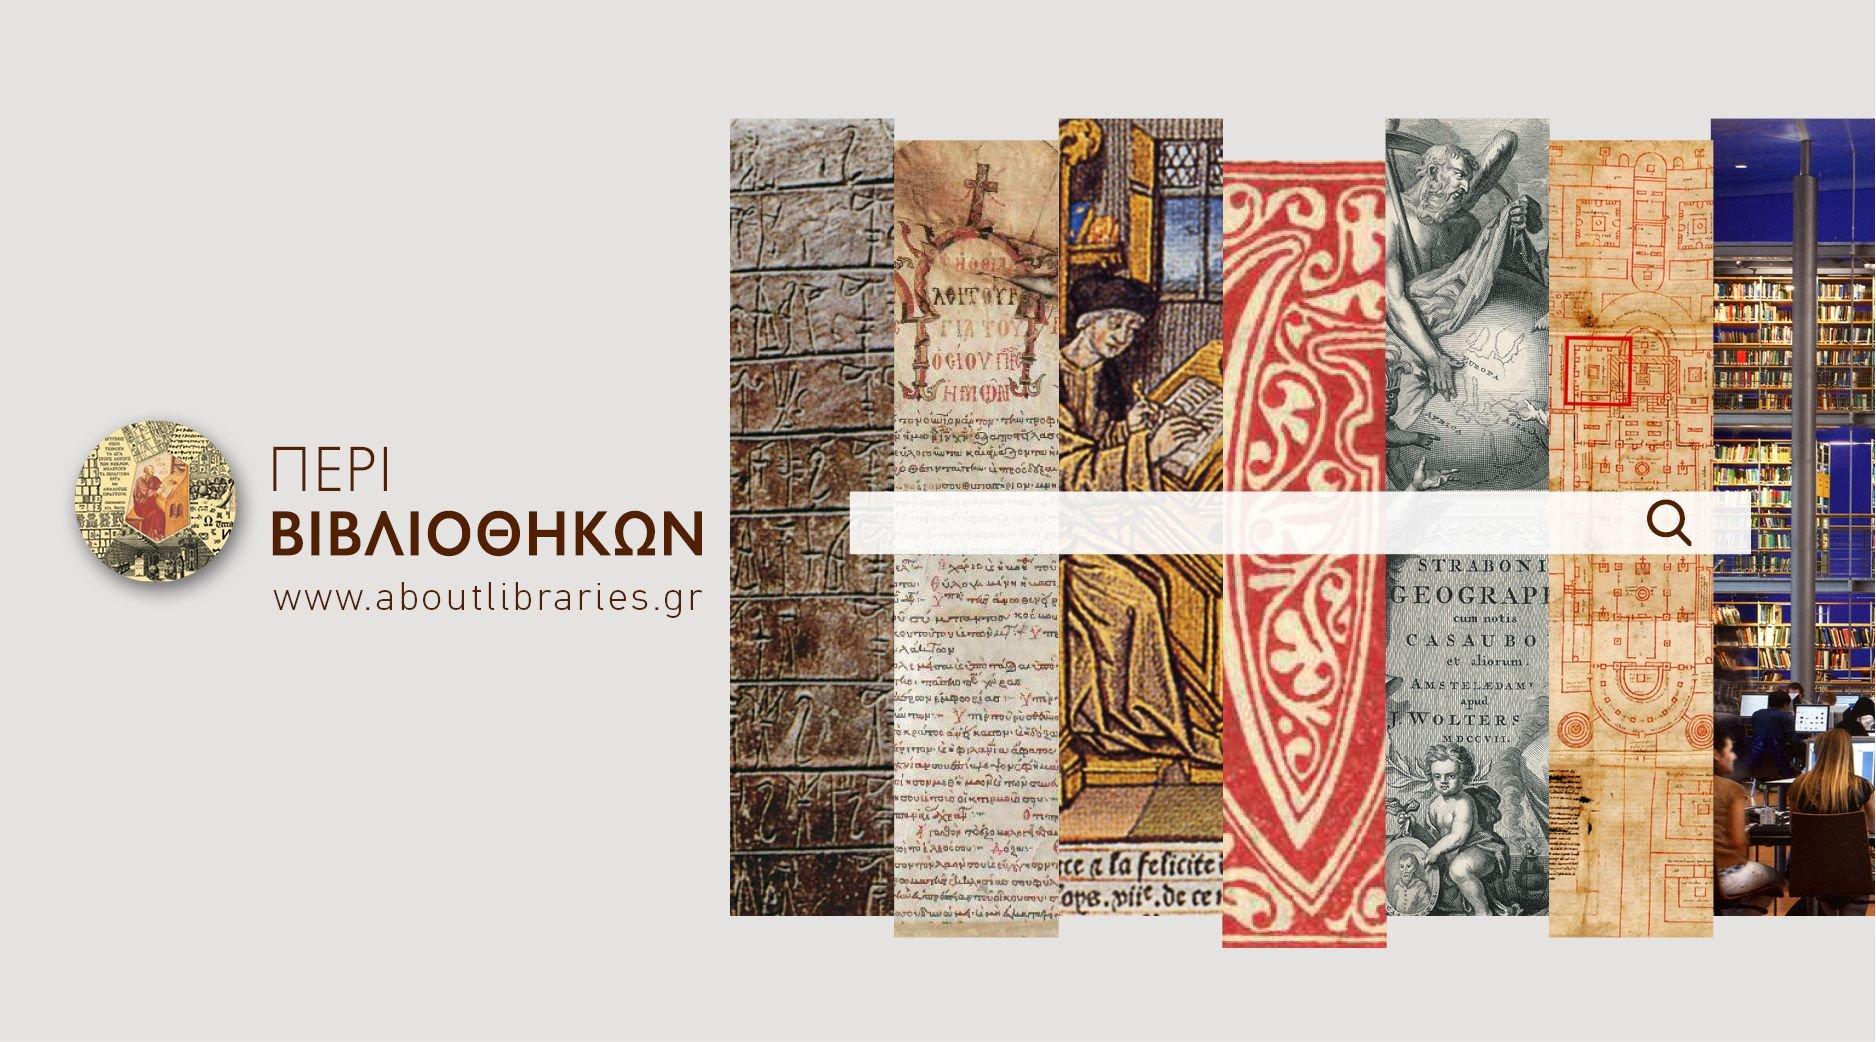 EKT AboutLibraries banner - ΕΚΤ εγκαινιάζει το Περί Βιβλιοθηκών aboutlibraries.gr